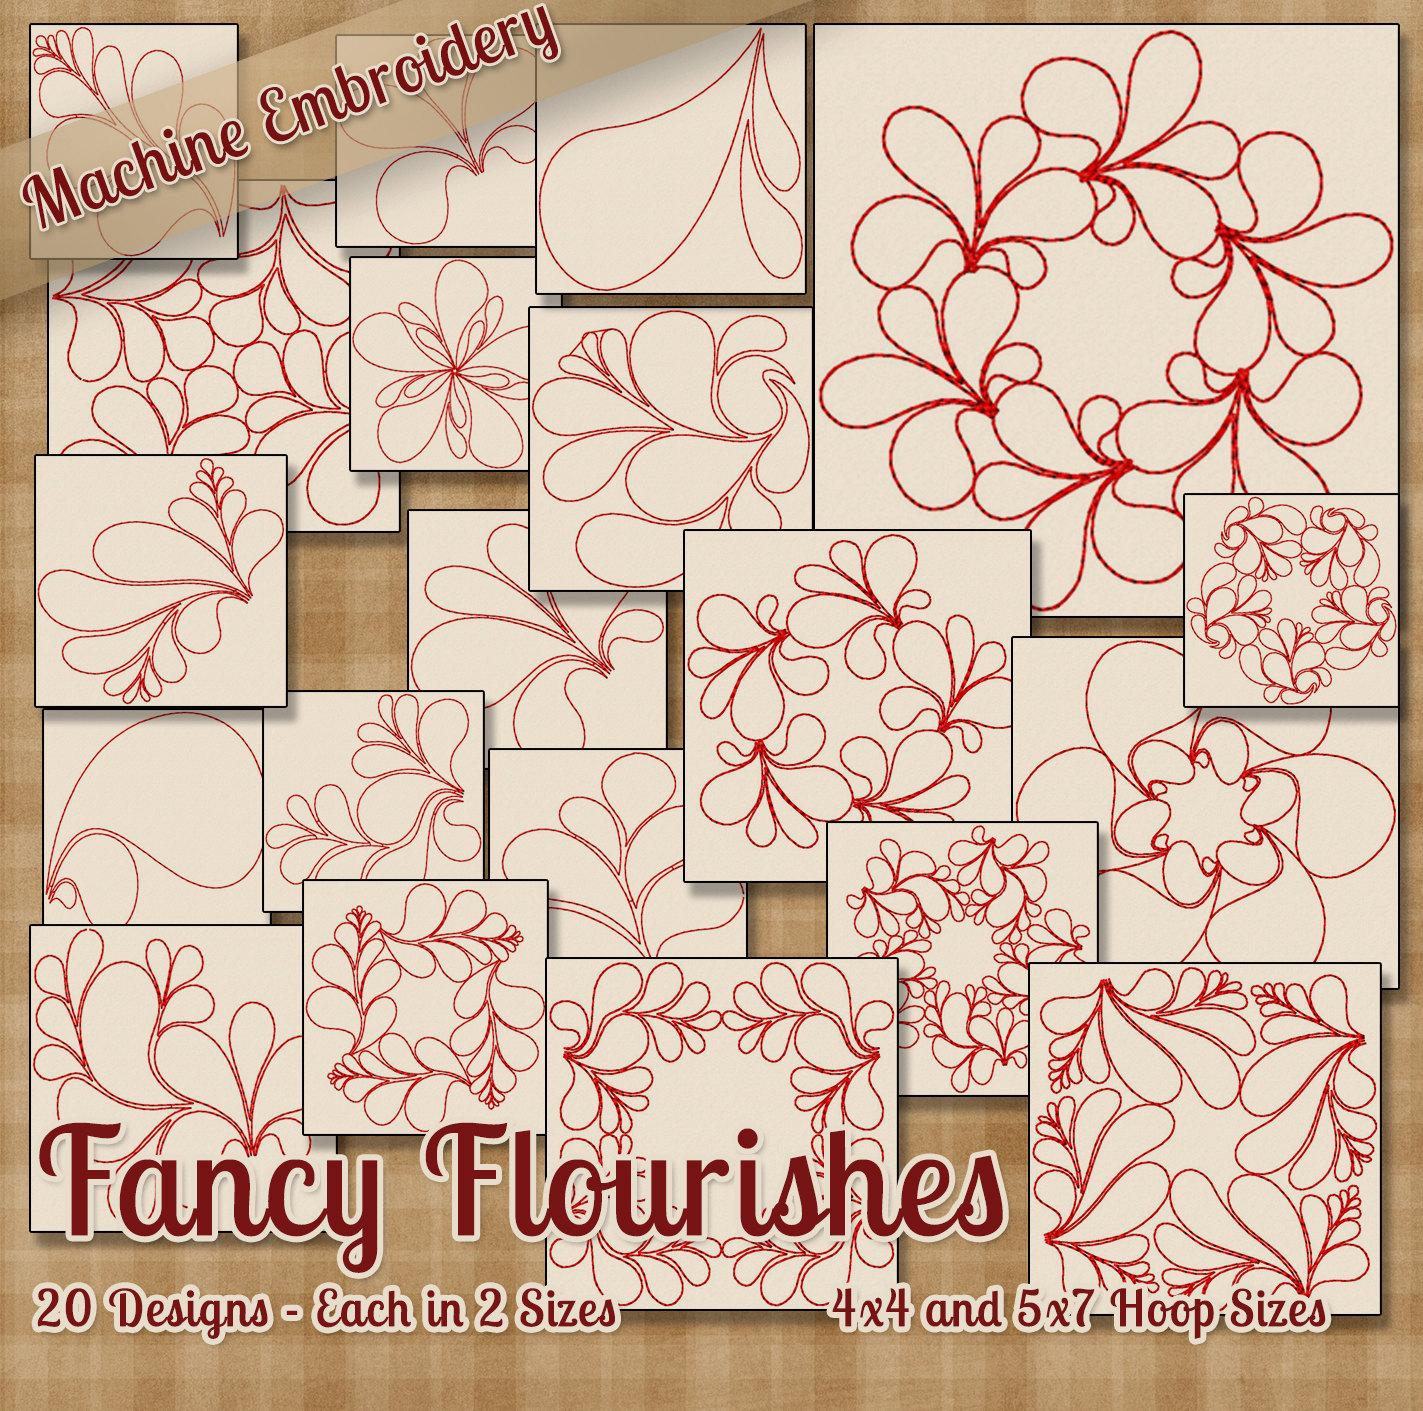 Embroidery Machine Patterns Download Fancy Flourishes Redwork Embroidery Machine Designs 20 Designs 2 Sizes Each Instant Download Elegant Embellishment Quilt Squares Patterns